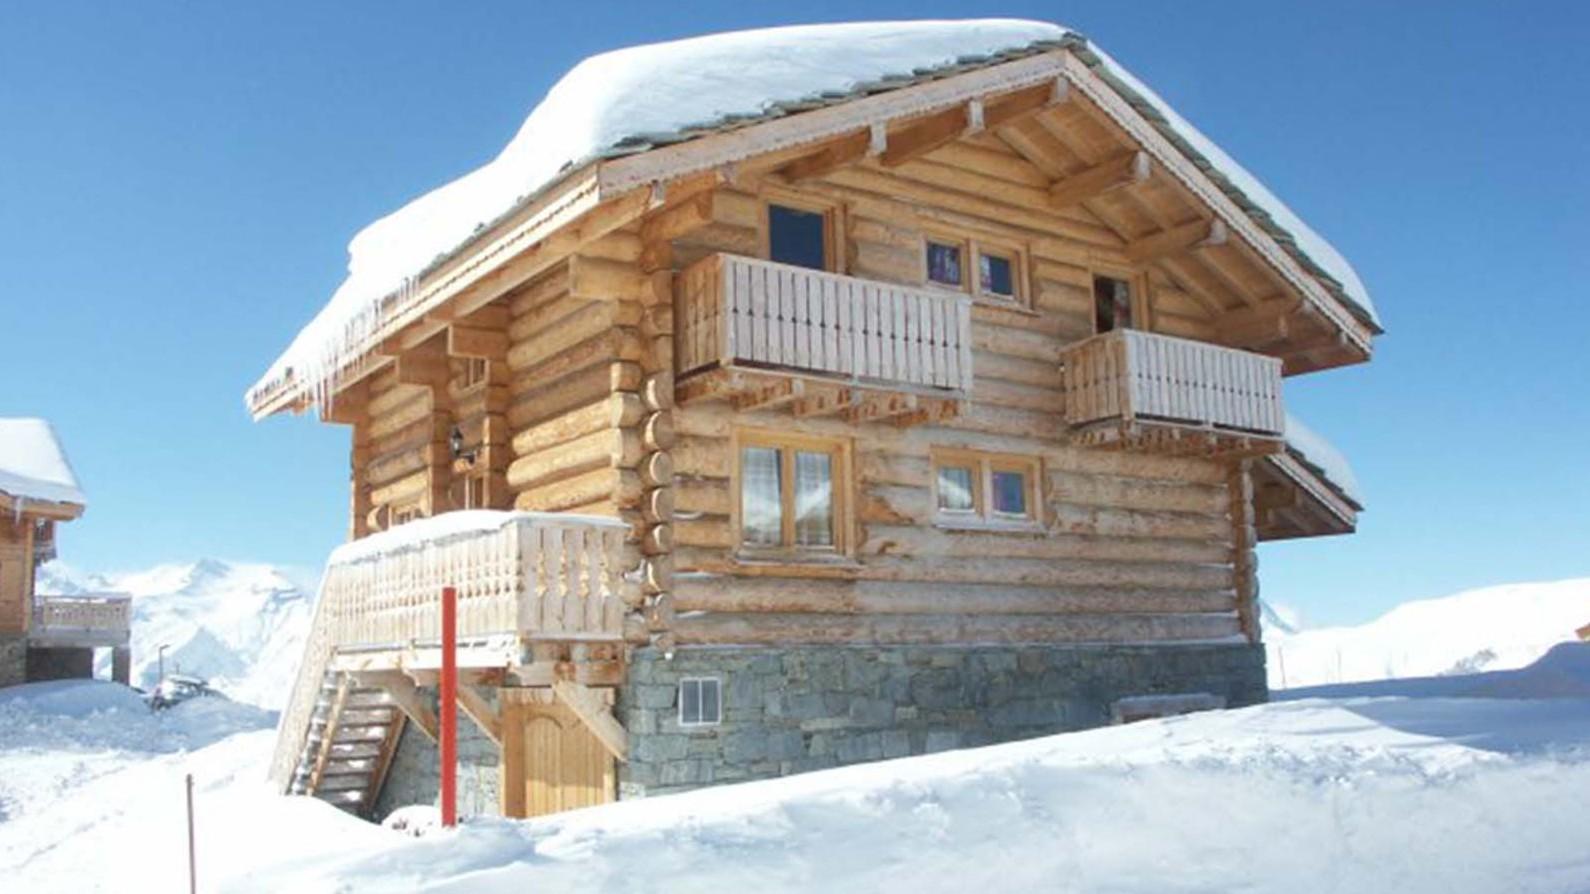 Exterior - Chalet Louisa - Ski Chalet in Alpe d'Huez, France